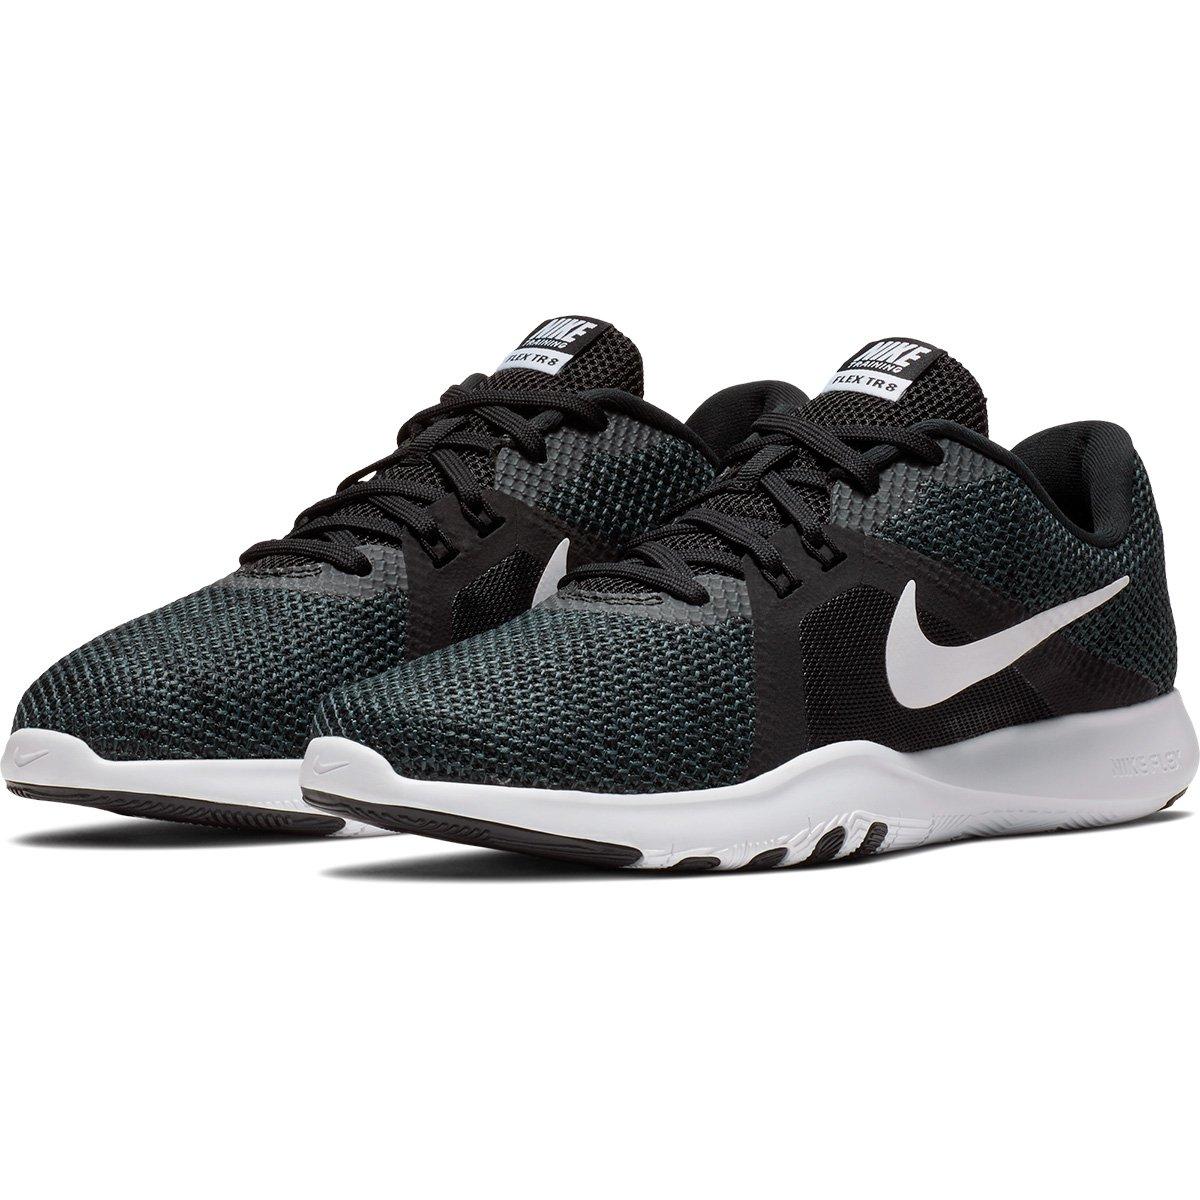 95594ec181 ... Branco Trainer Tênis Nike Nike e Preto Flex Flex Feminino 8 Tênis  wwgTv6xX ...